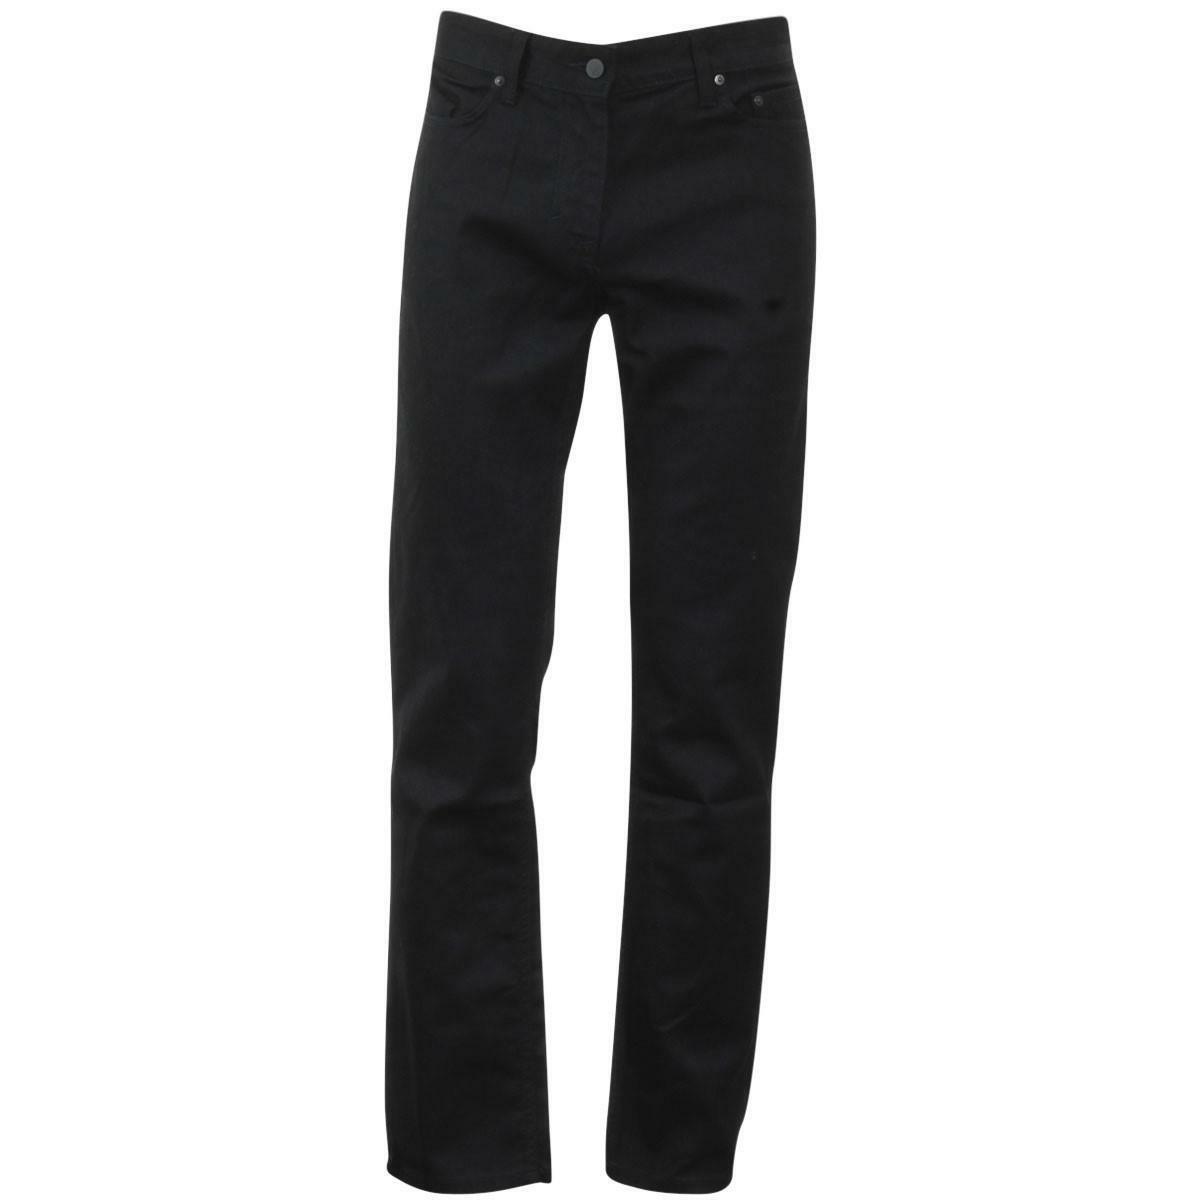 CALVIN LEG Jeans Authentic BRAND